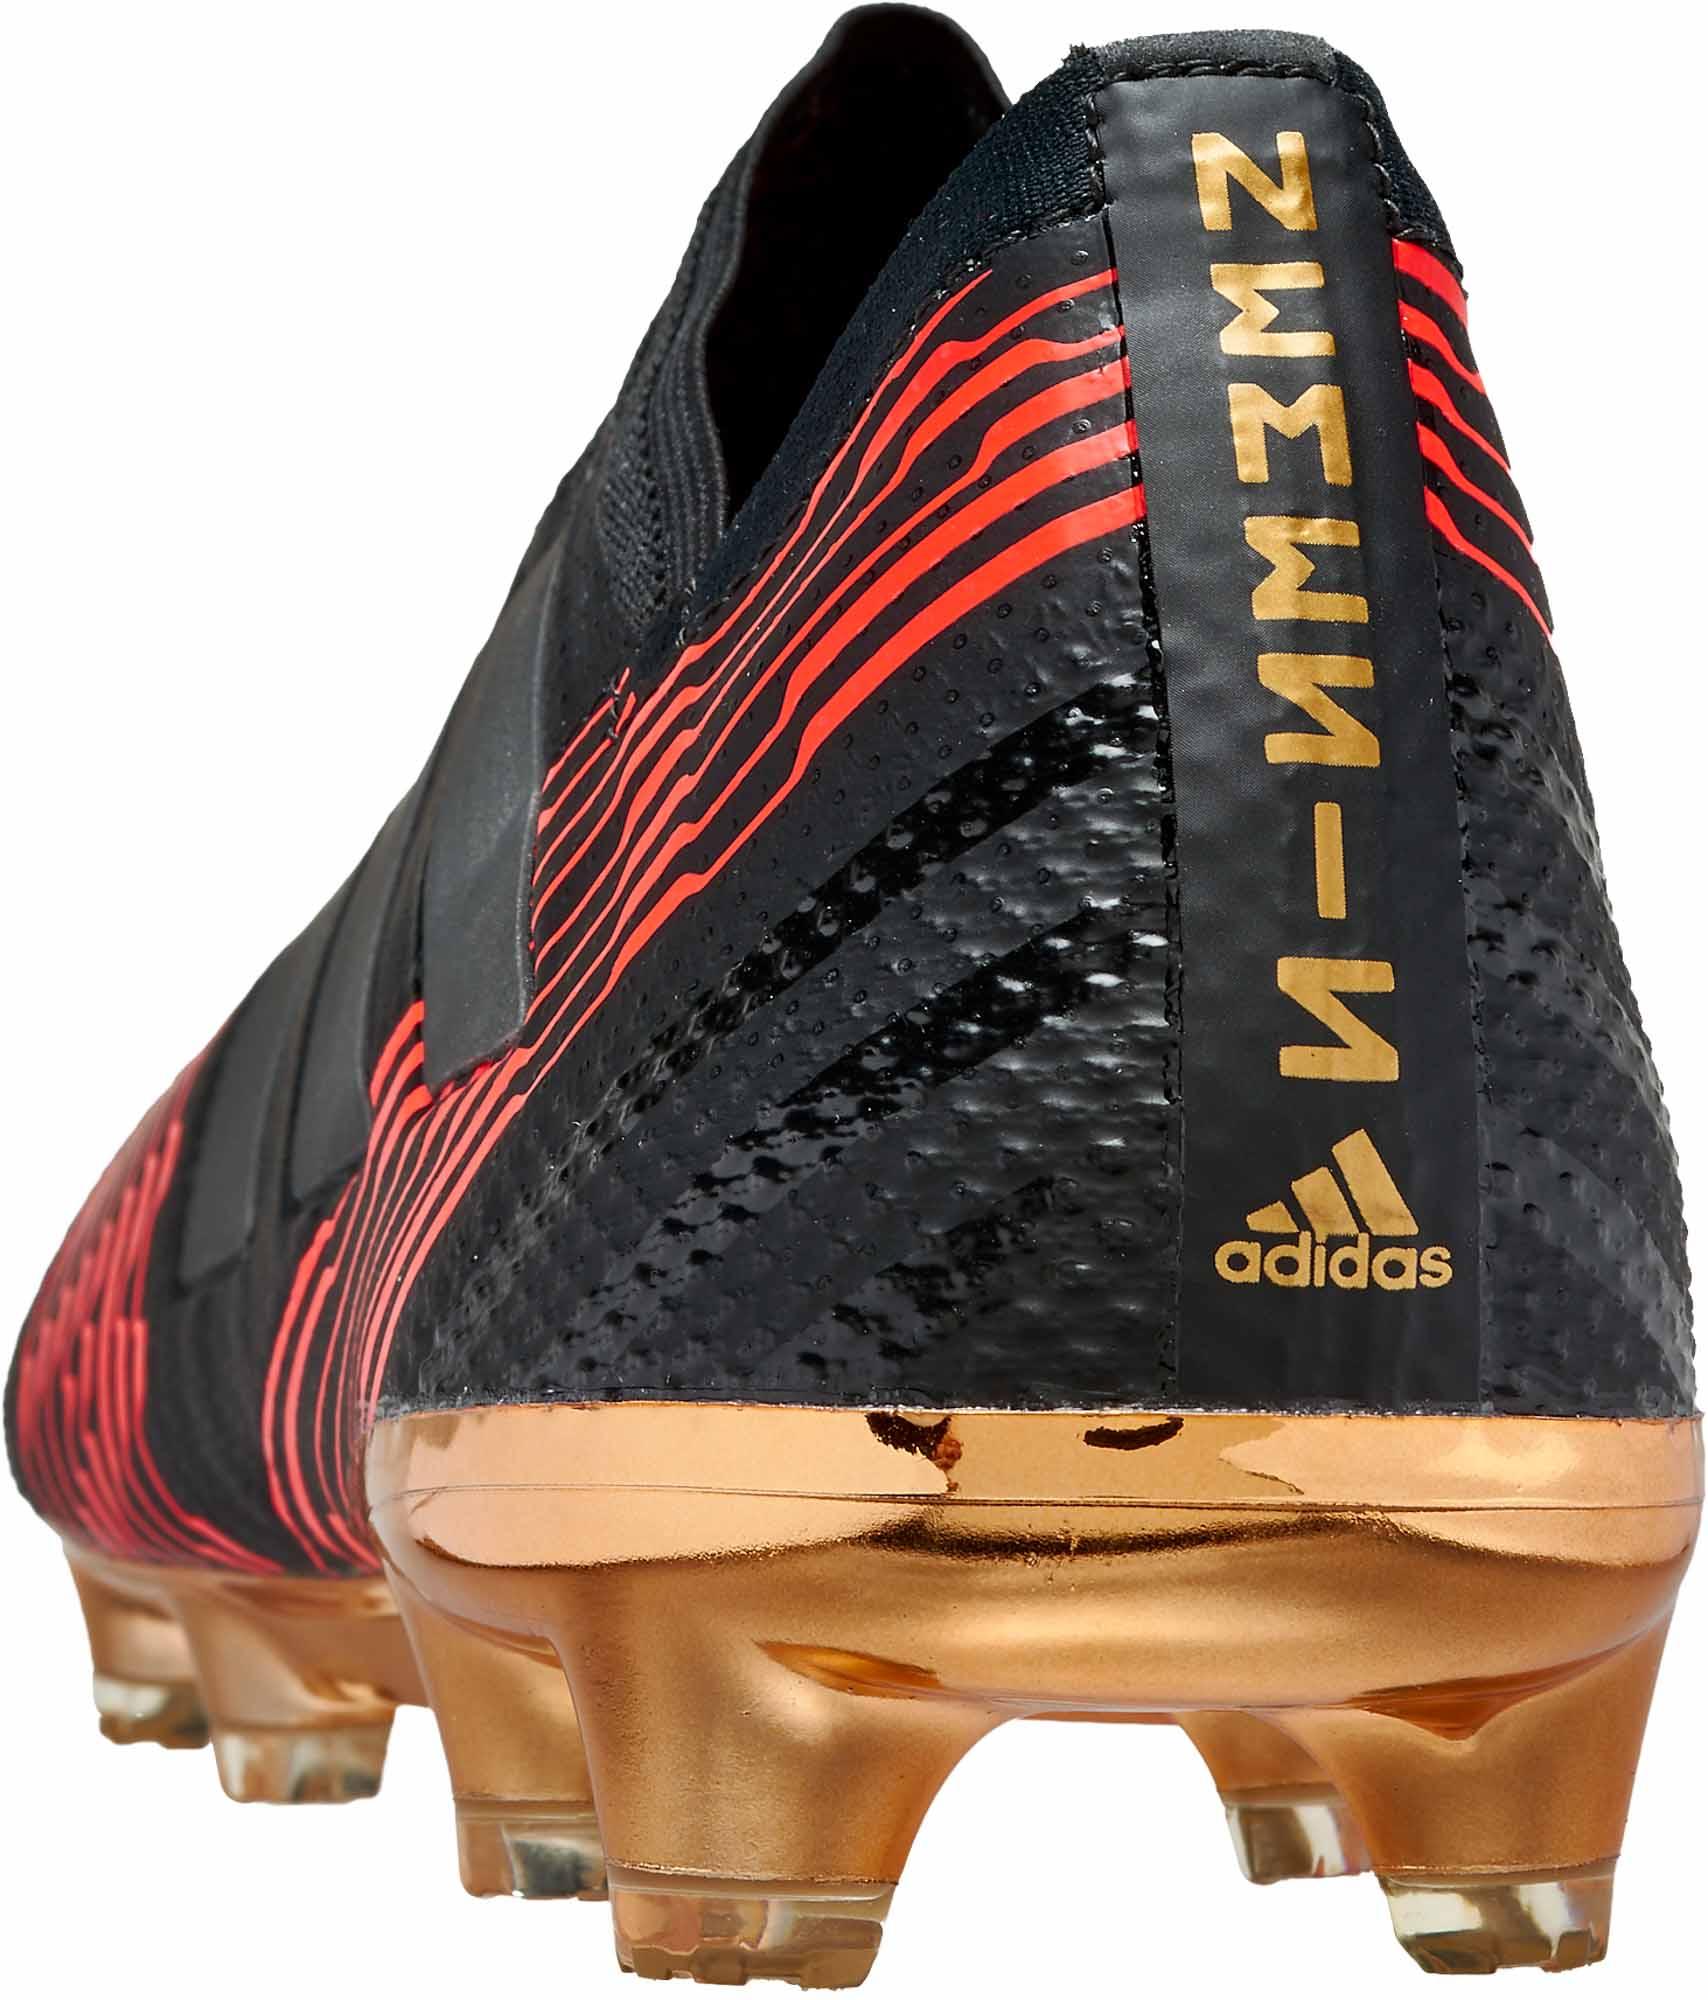 Adidas Nemeziz 17 Fg Black Lionel Messi Soccer Cleats